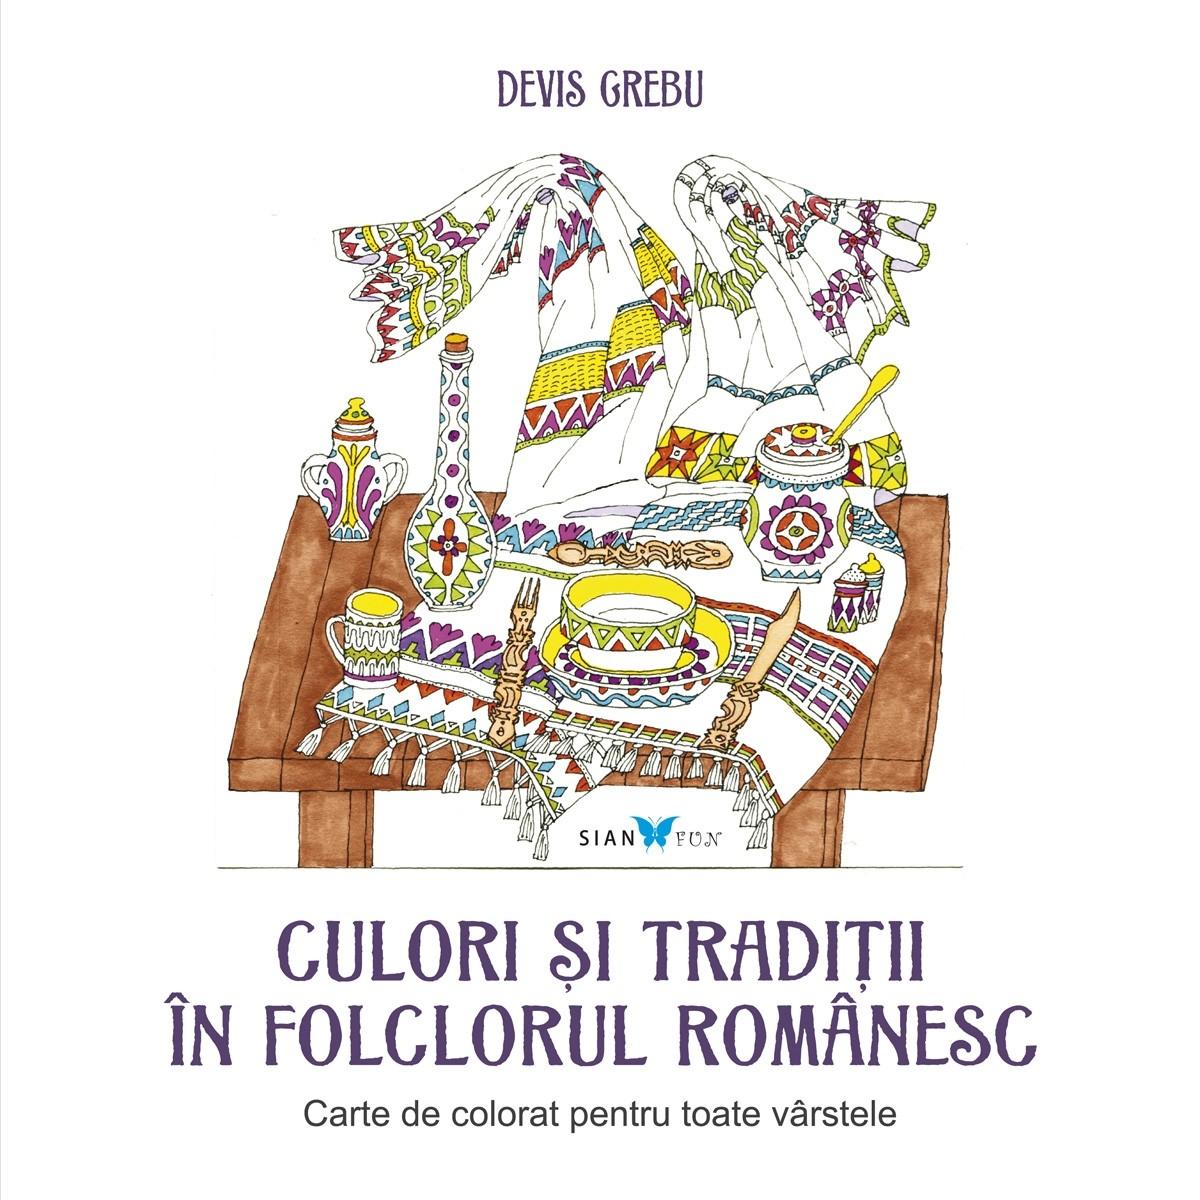 coperta-culori-si-traditii-in-folclorul-romanesc